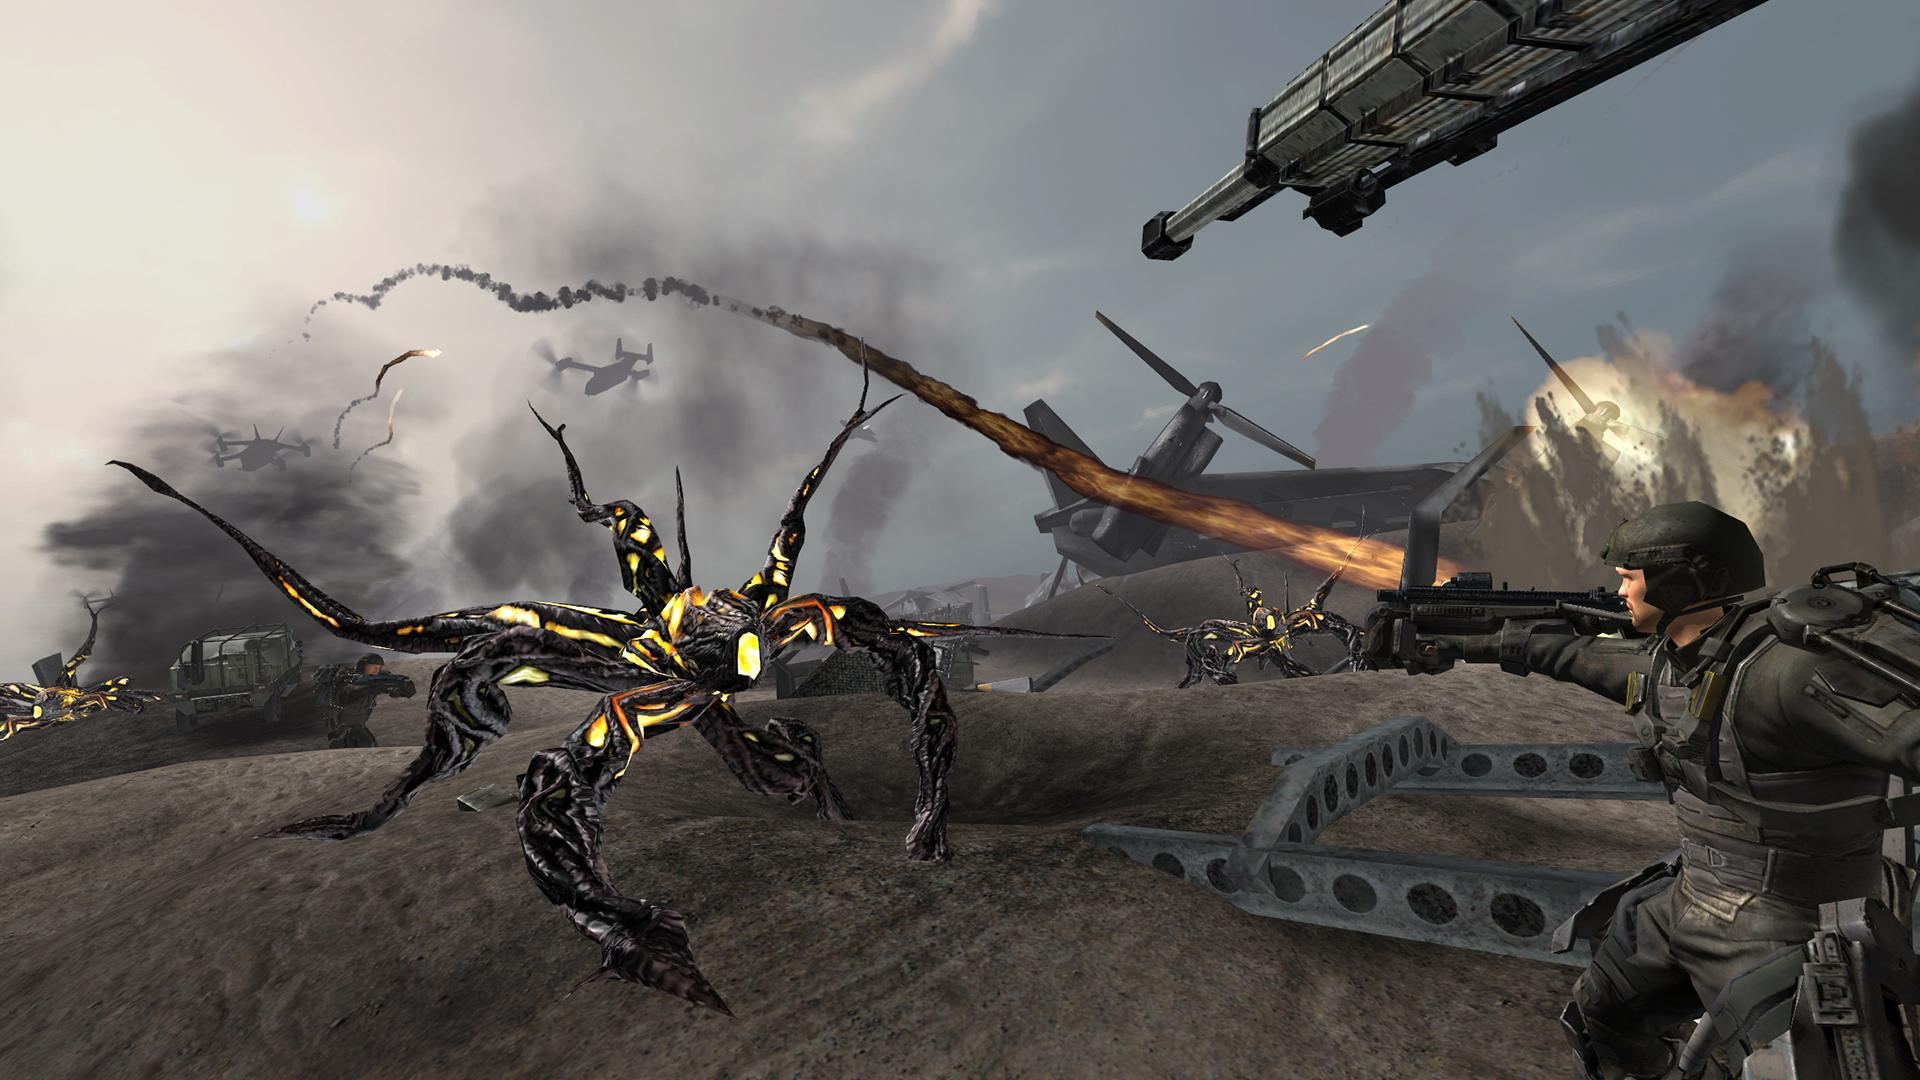 Edge of Tomorrow Game screenshot #5